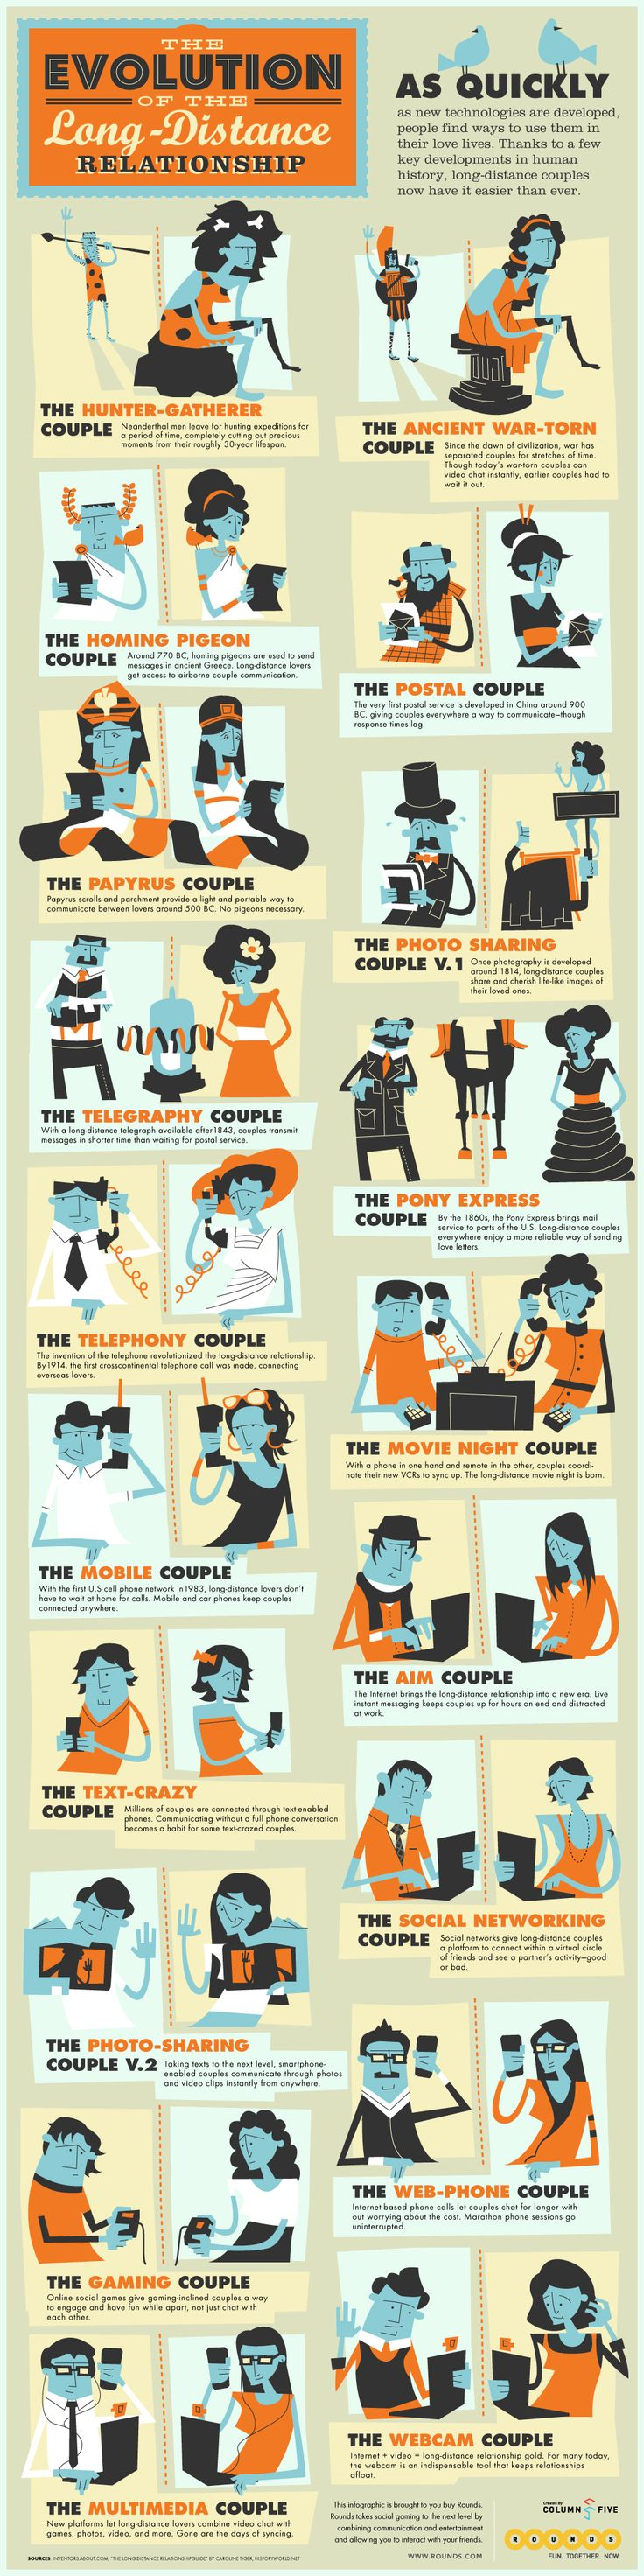 Psychology : The Evolution of Long Distance Relationships